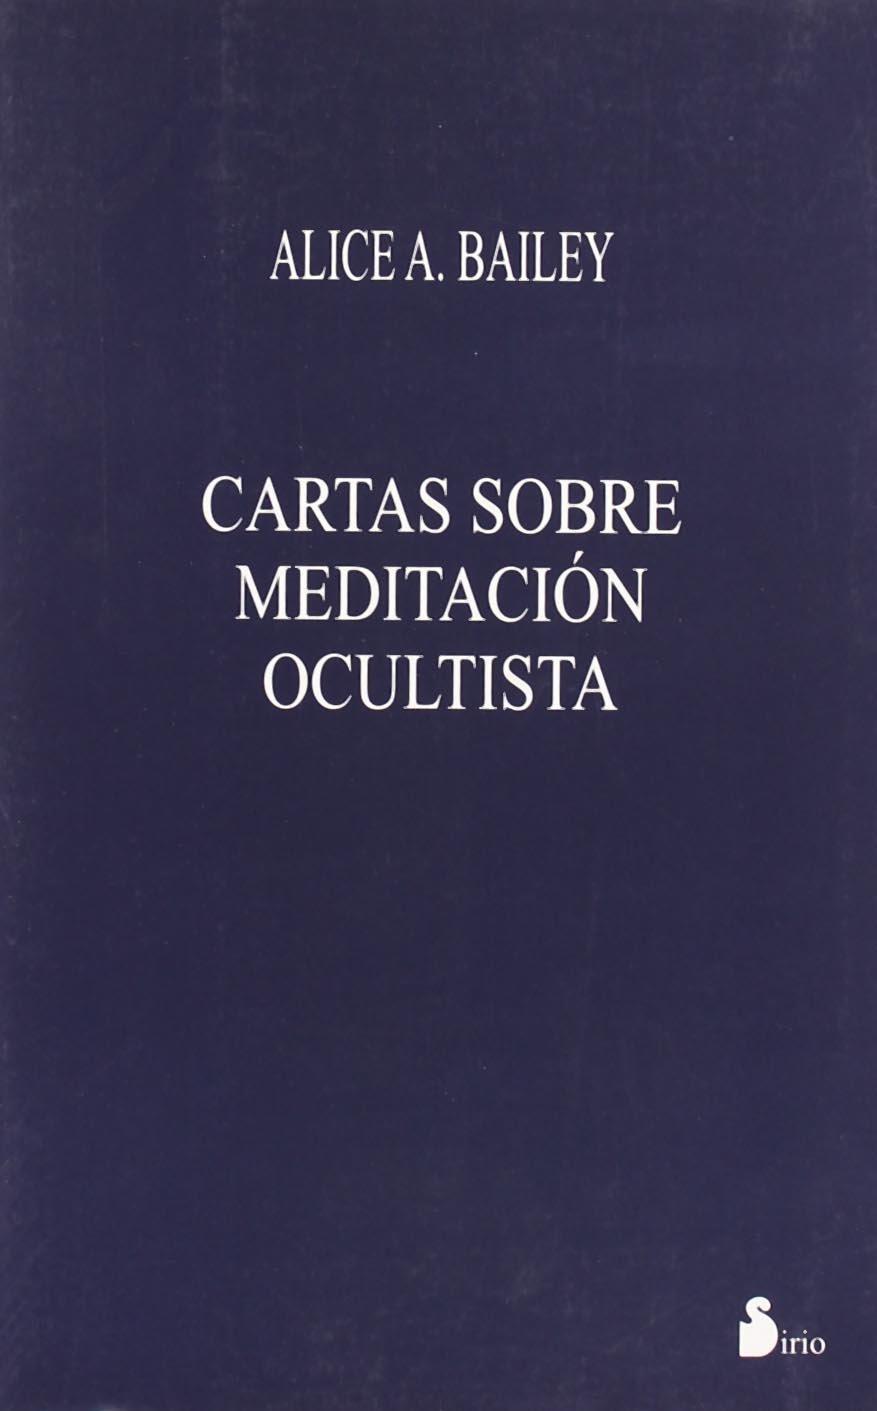 Cartas de meditación ocultista